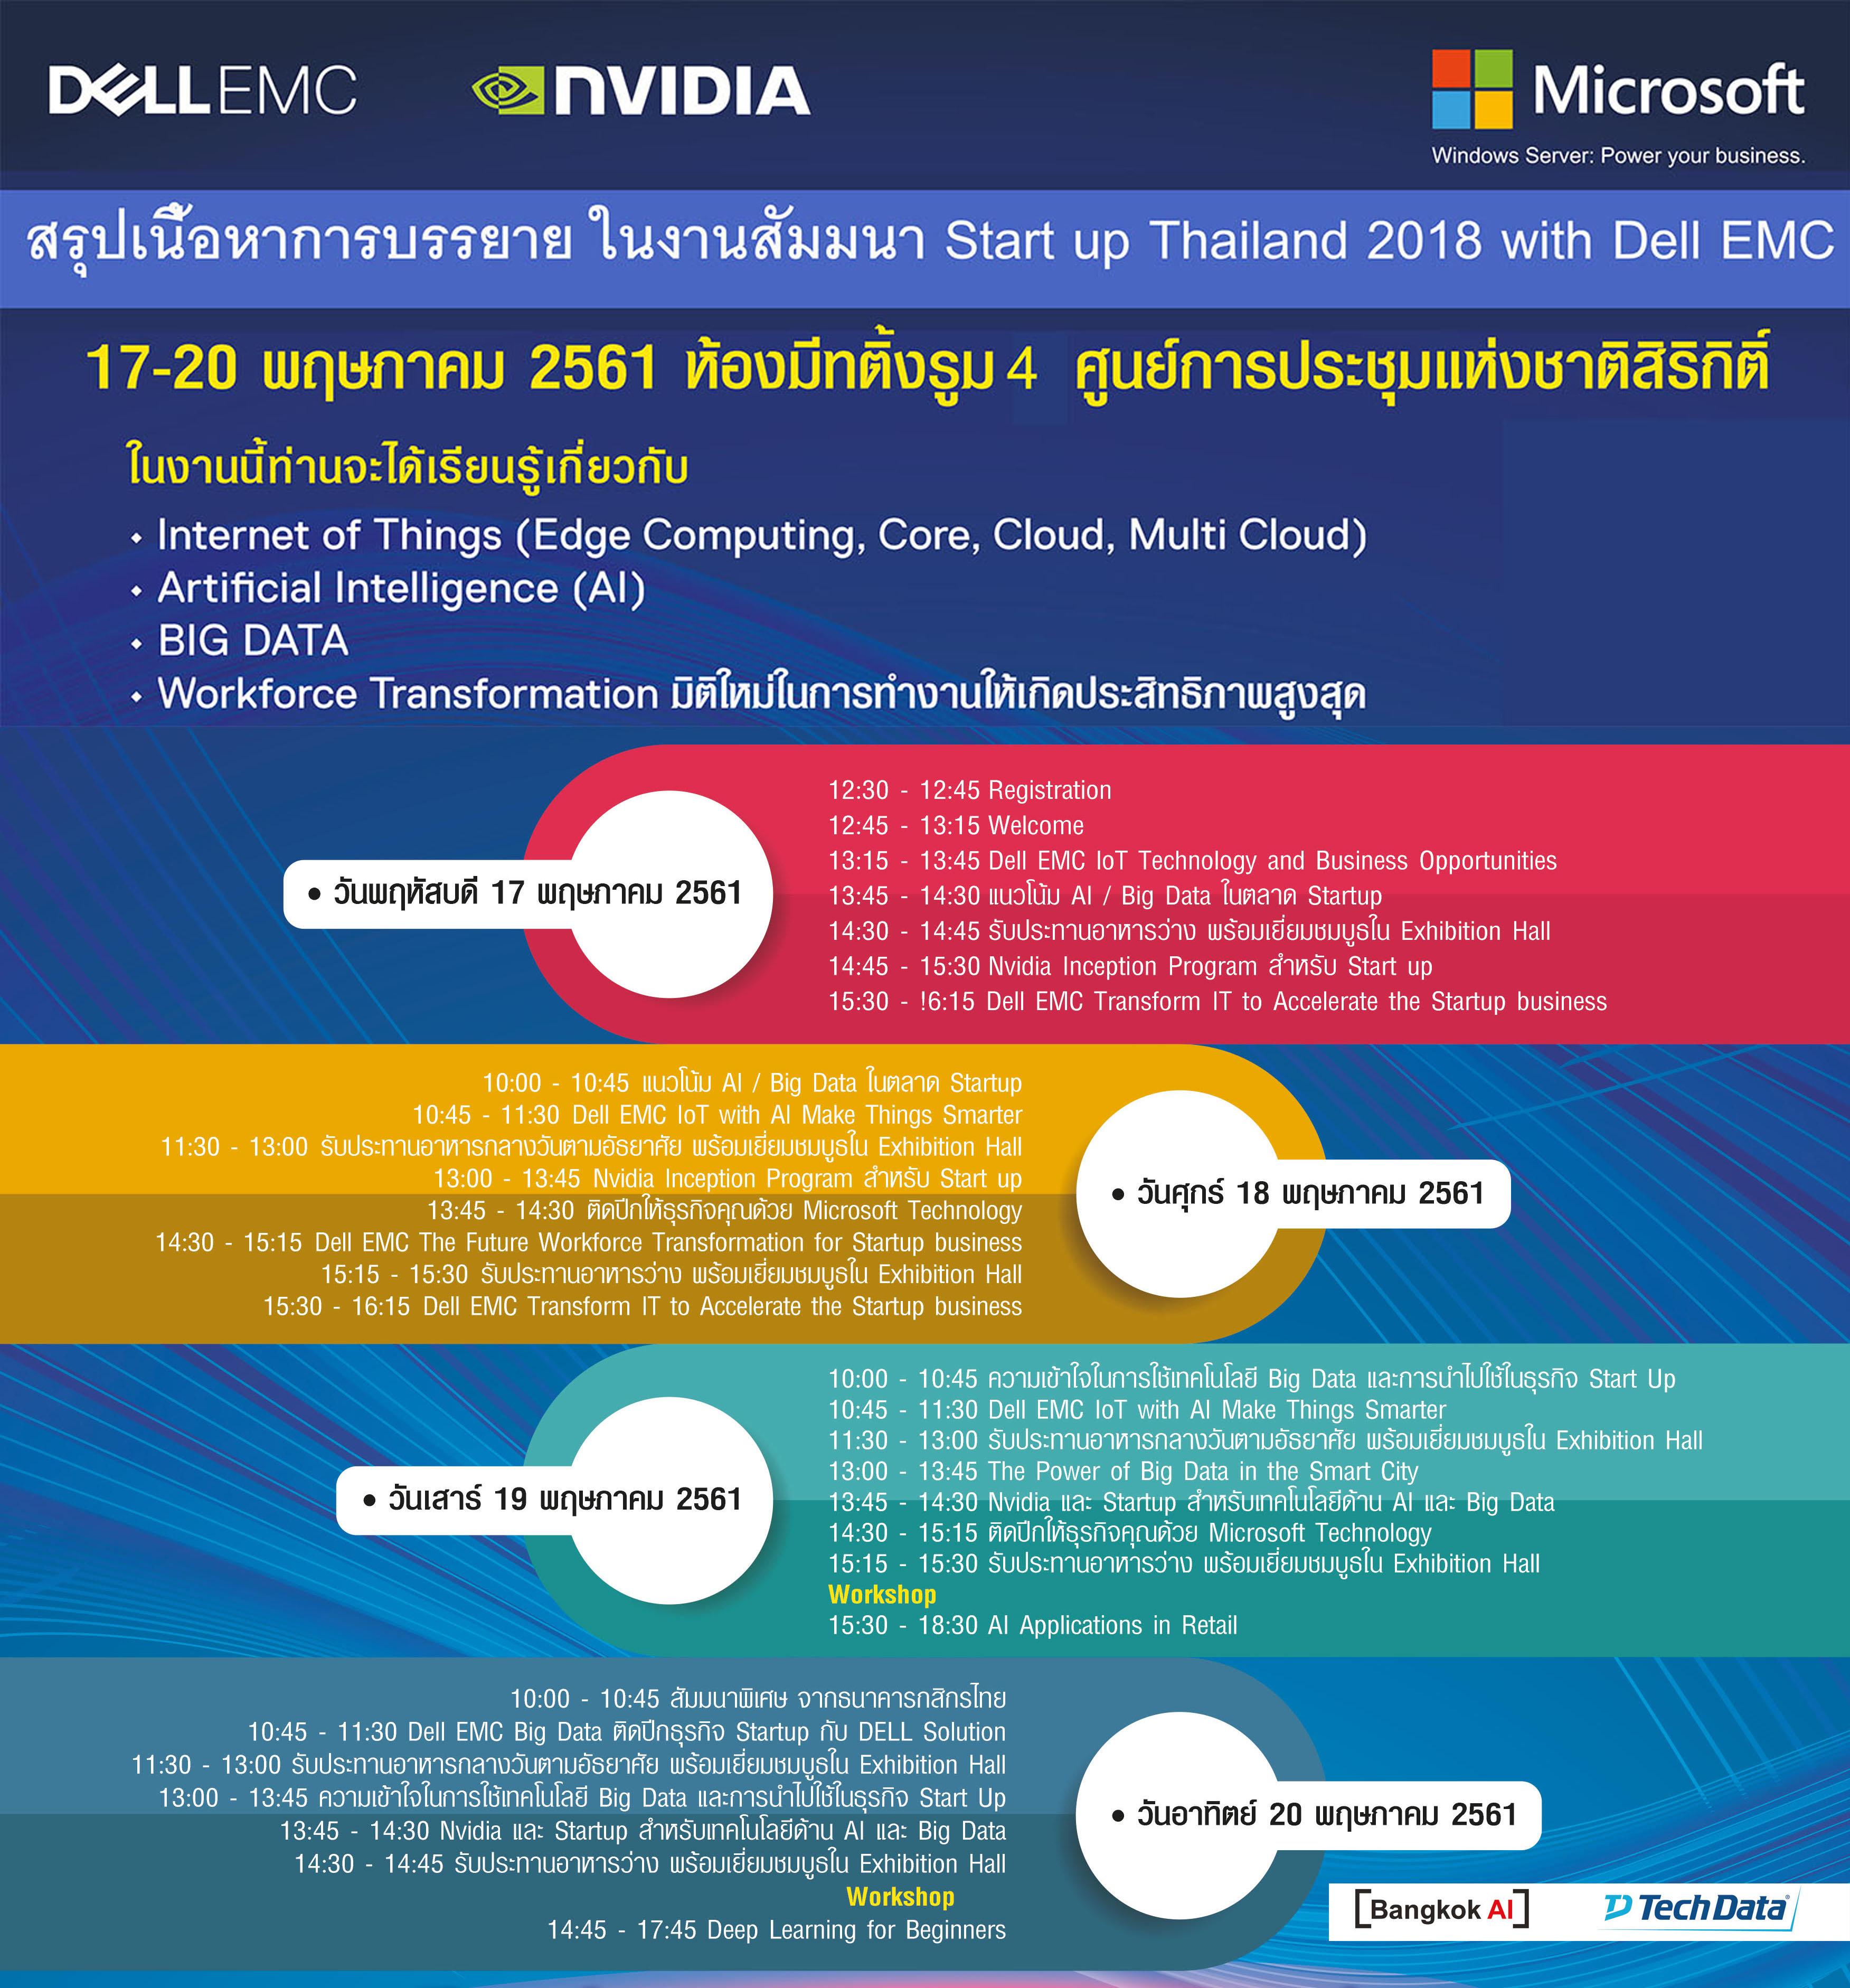 start-up-thailand18-dellemc-ssanetwork-สรุปงานสัมมนา-2